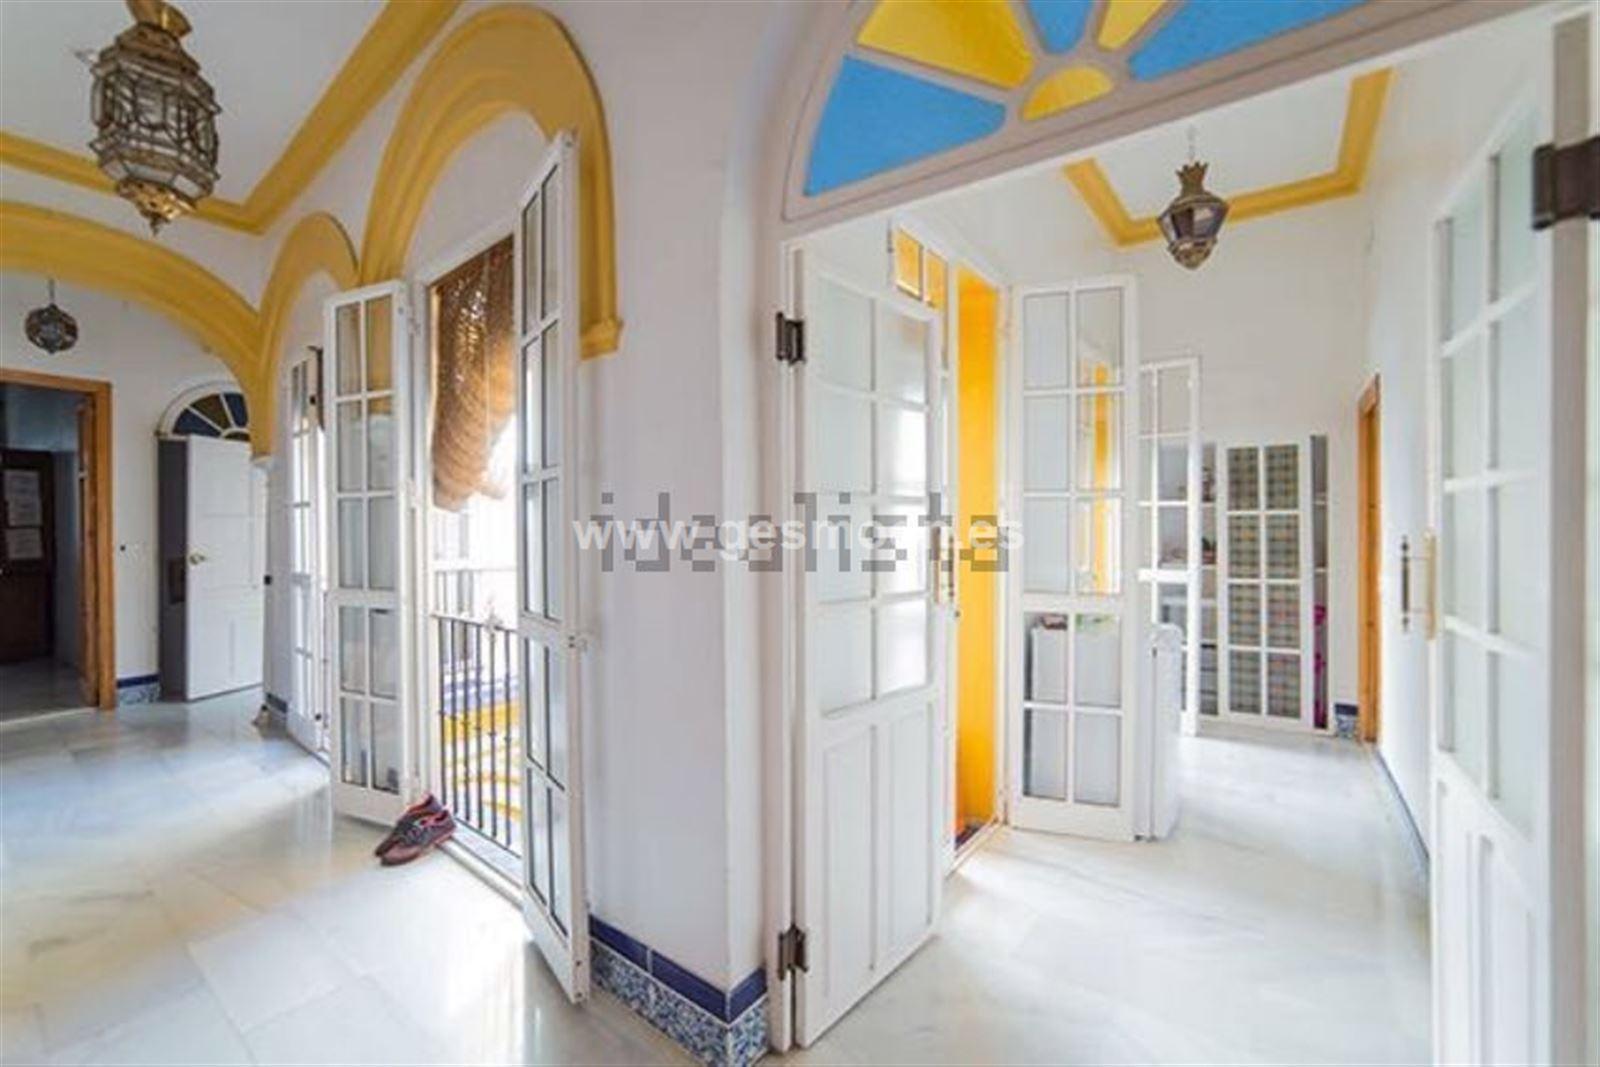 Casa Para Rehabilitar en el Centro de Sevilla